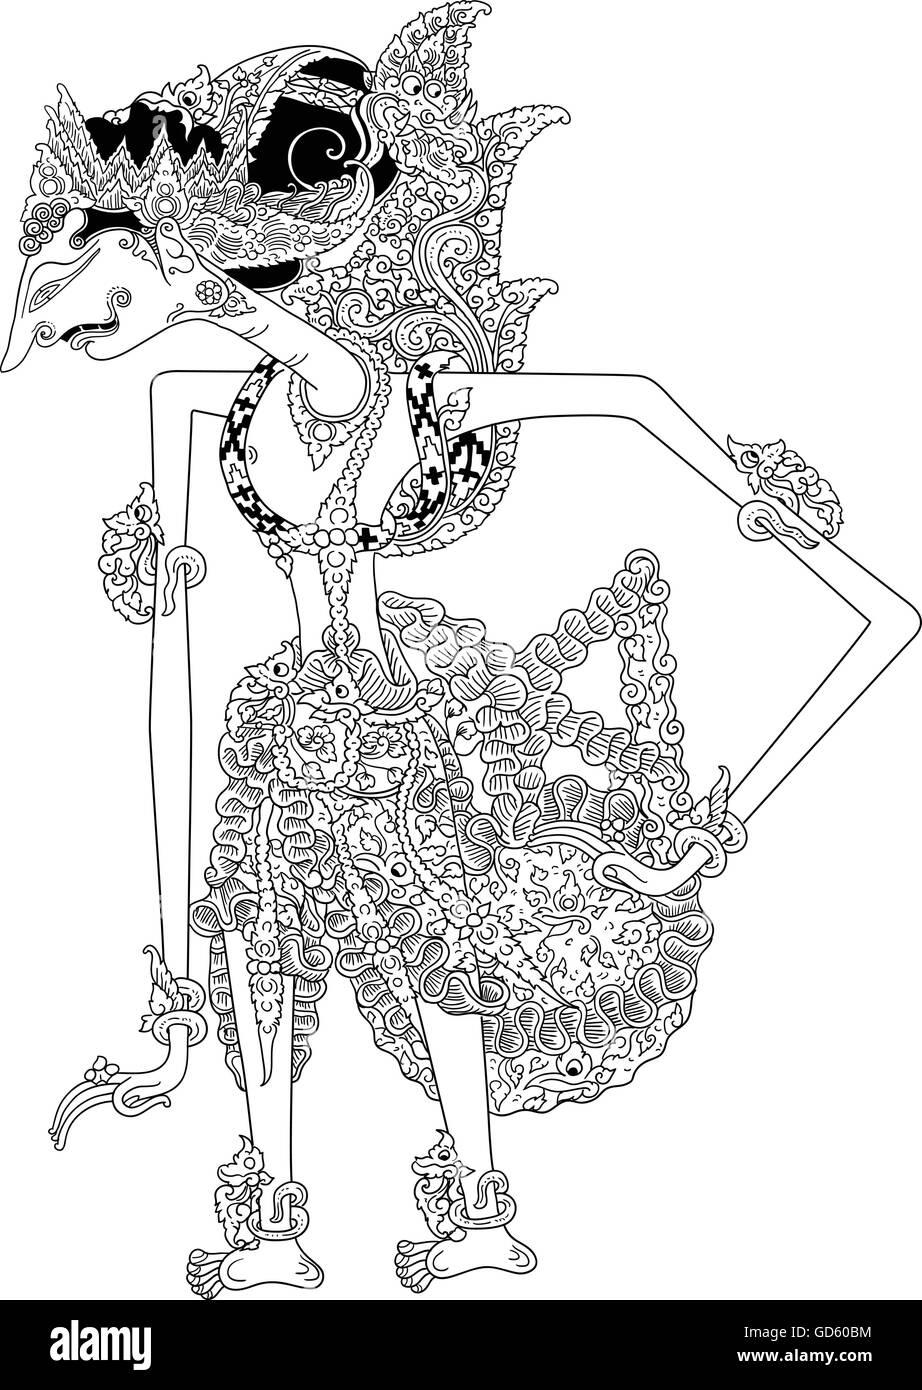 Wayang Rama Vector : wayang, vector, Dentawilukrama,, Character, Traditional, Puppet, Show,, Wayang, Kulit, Stock, Vector, Image, Alamy